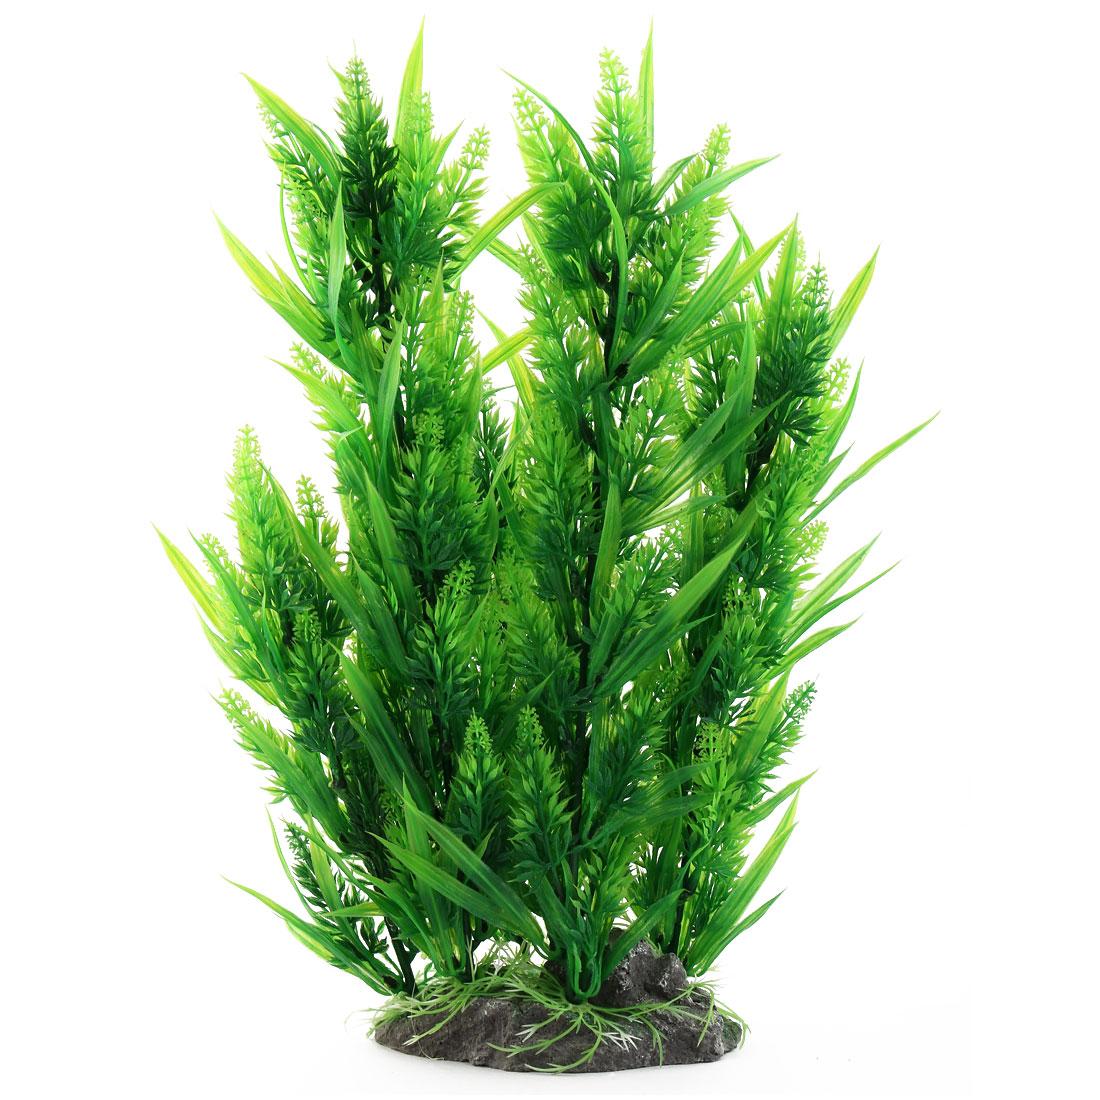 Aquarium Aquatic Ceramic Artificial Leaf Plant Grass Lawn Green 38cm Length